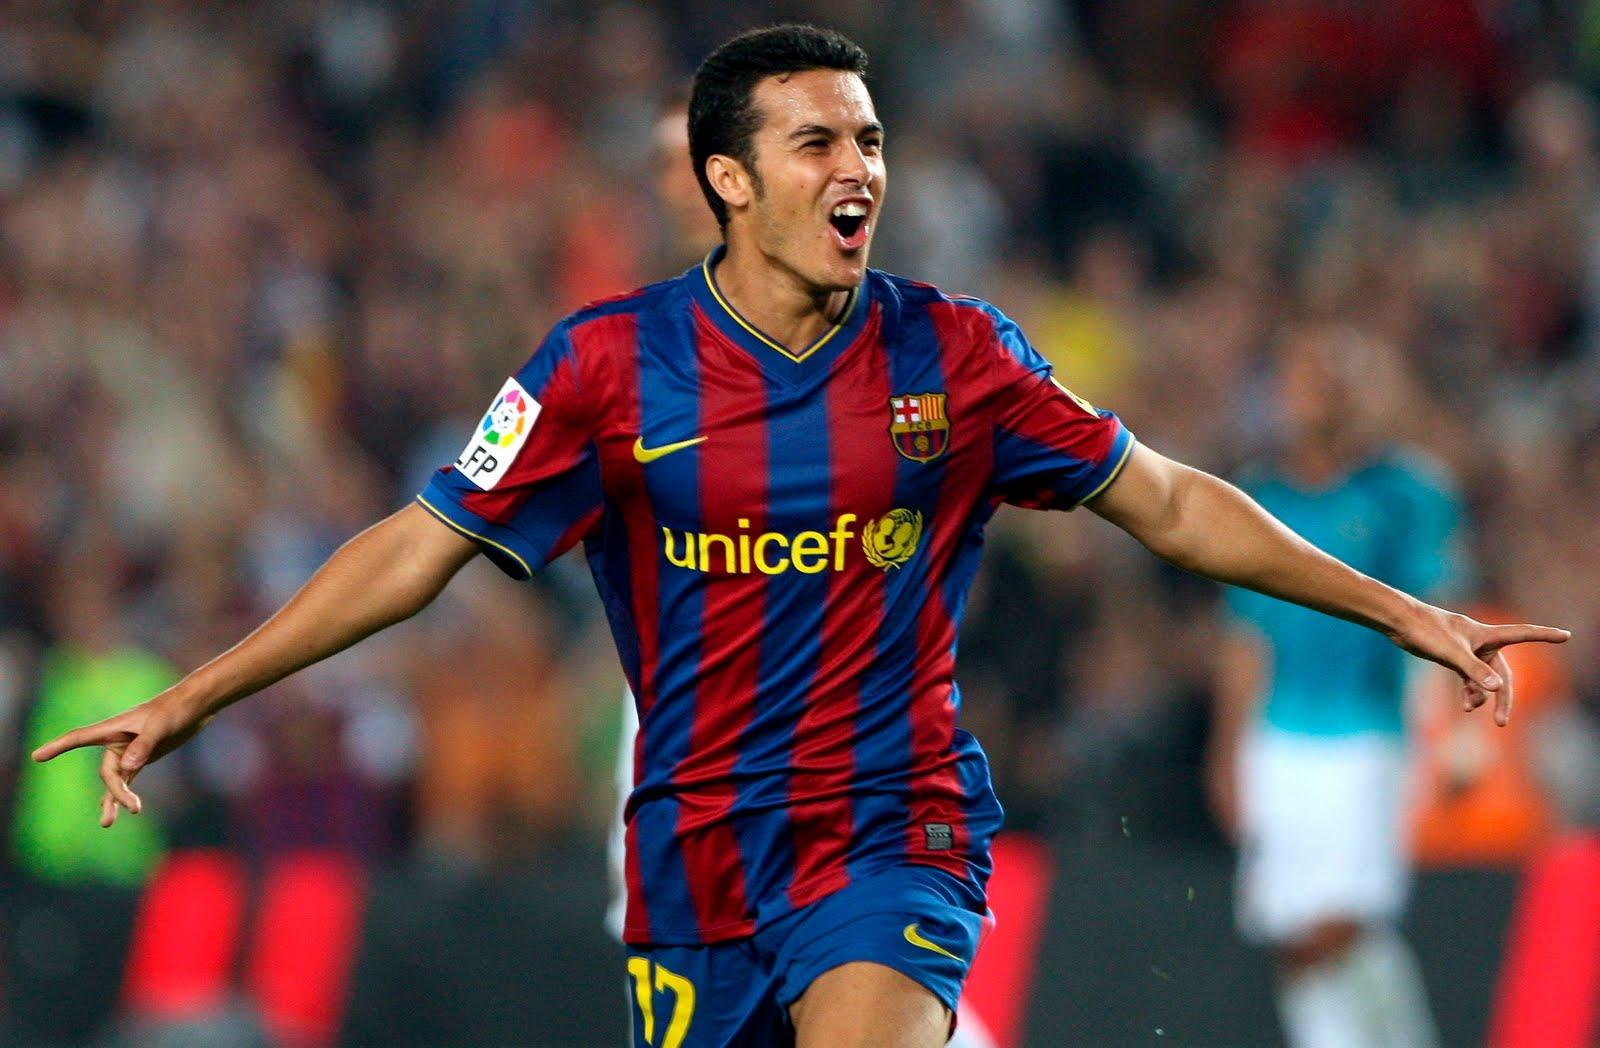 Pedro Rodriguez Footballer Biography,Photos And Profile